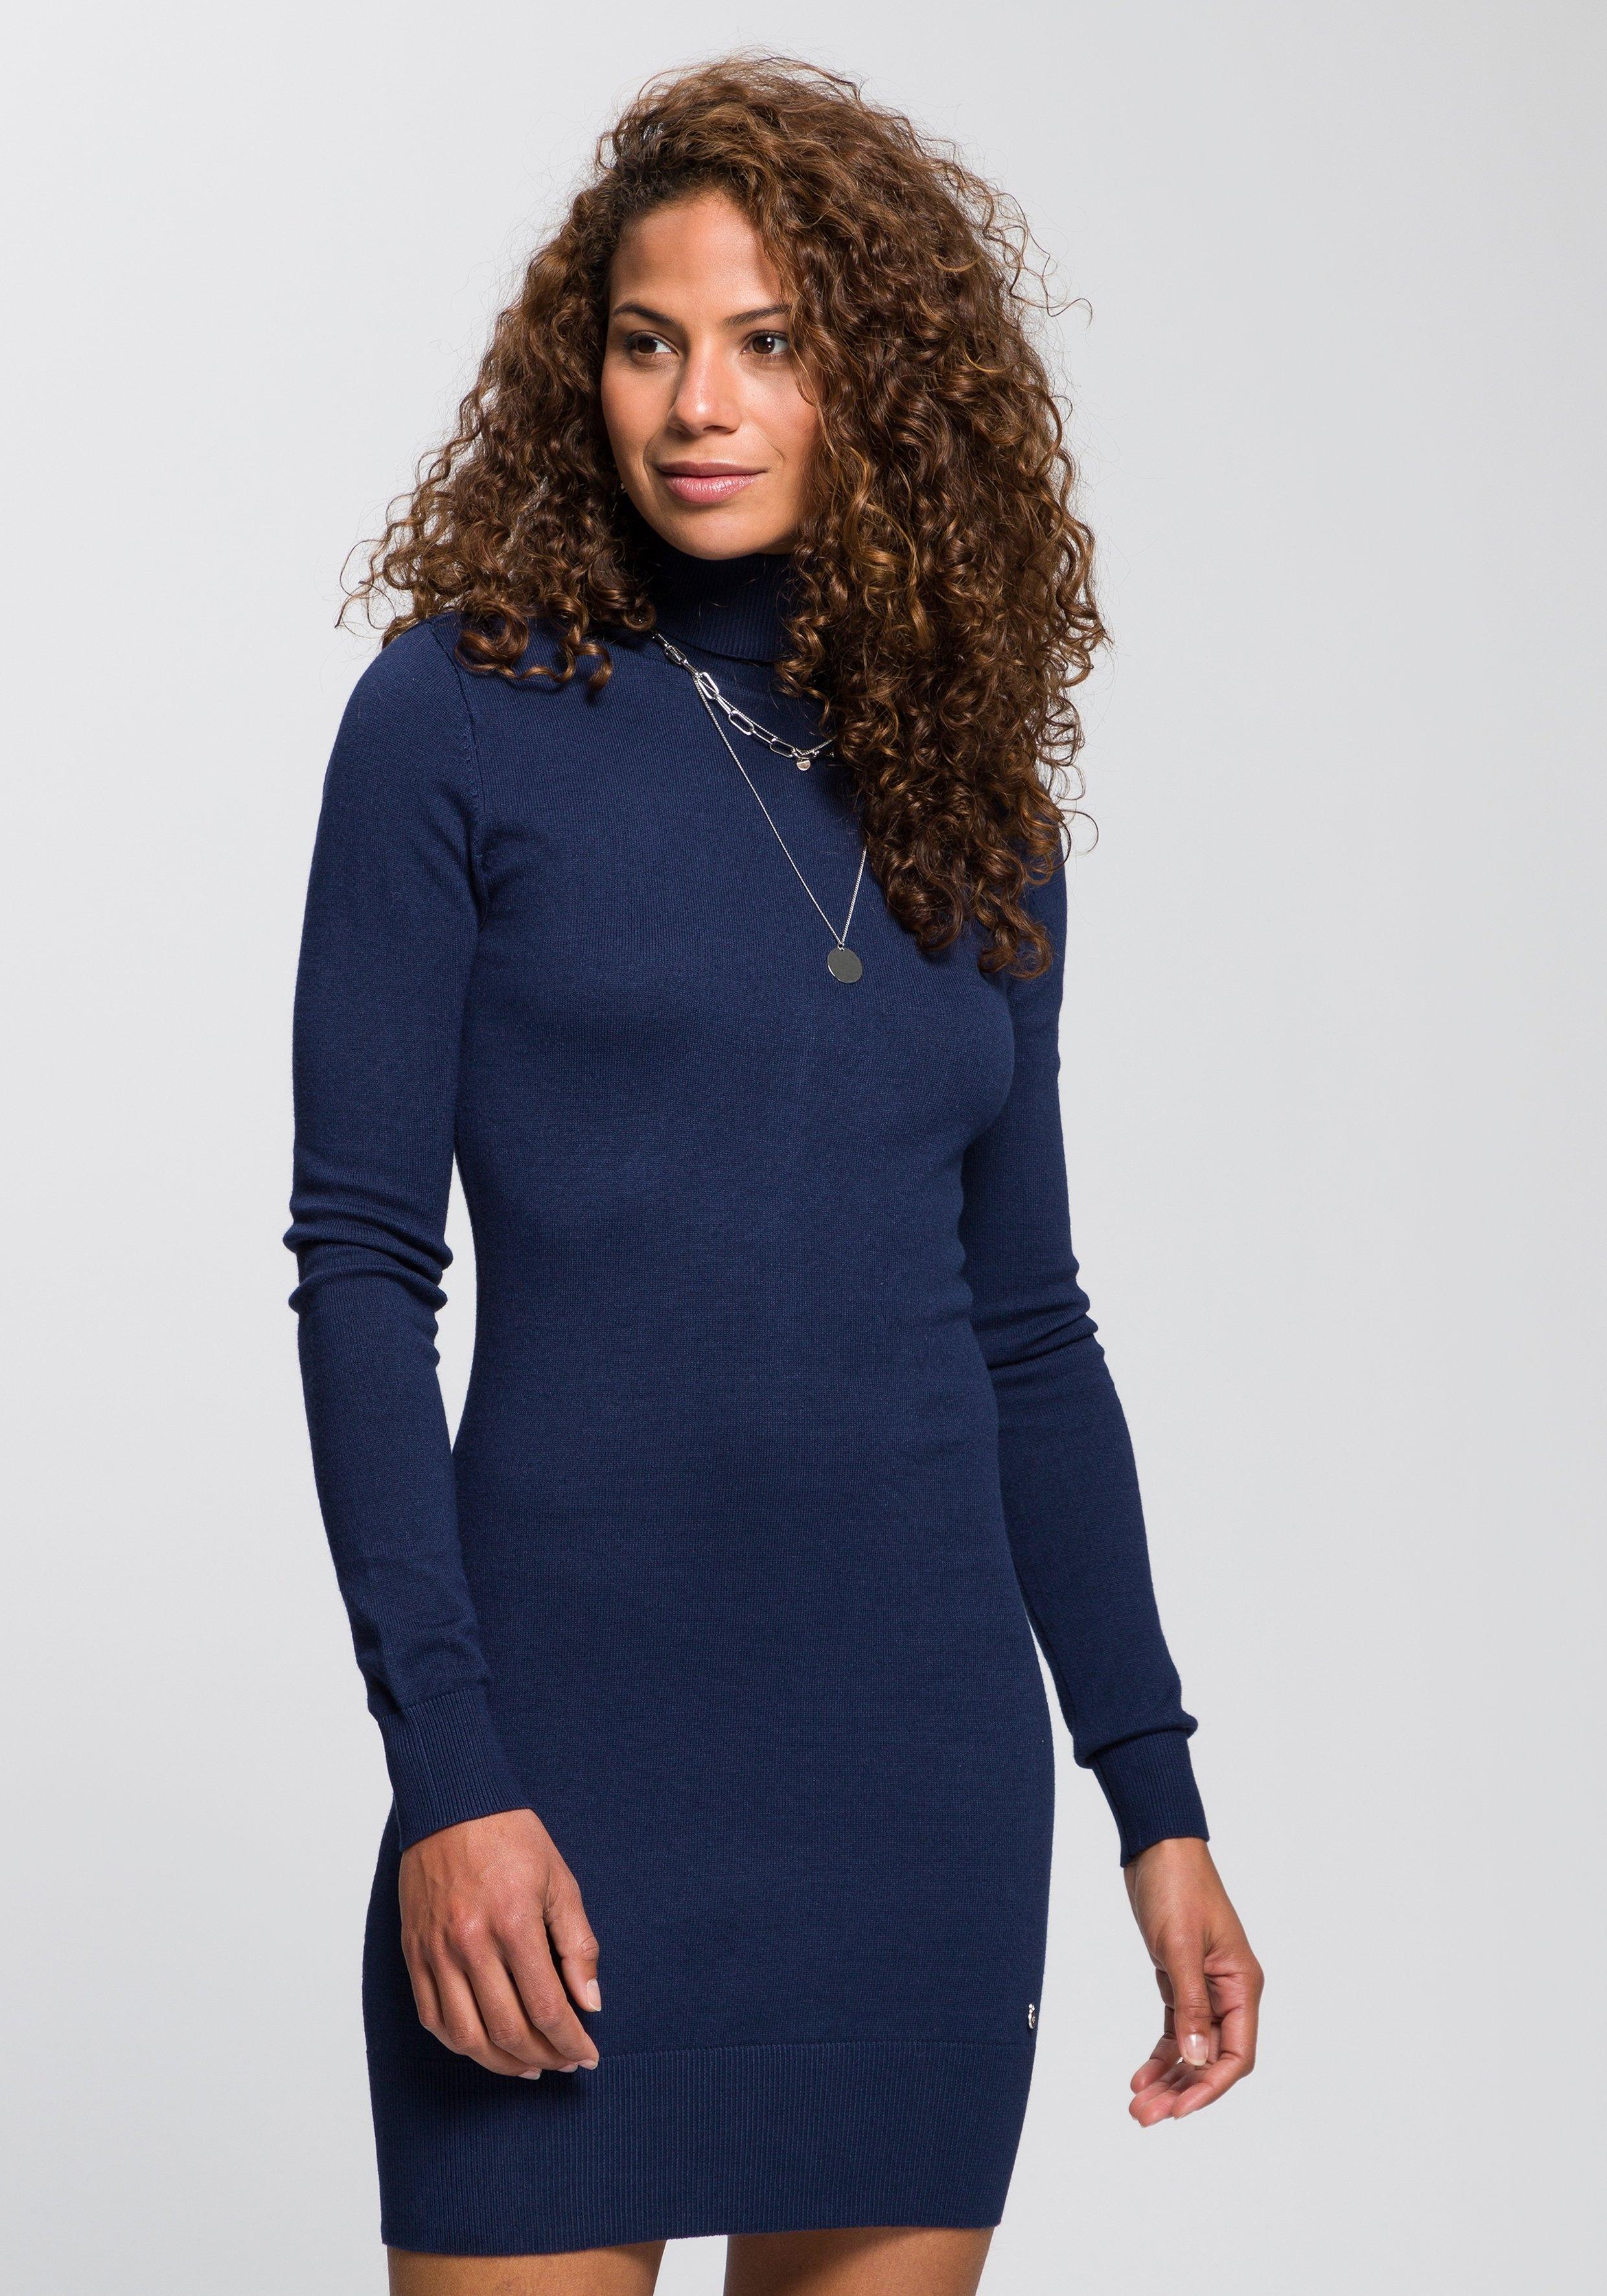 AJC tricotjurk met mooie col nu online bestellen